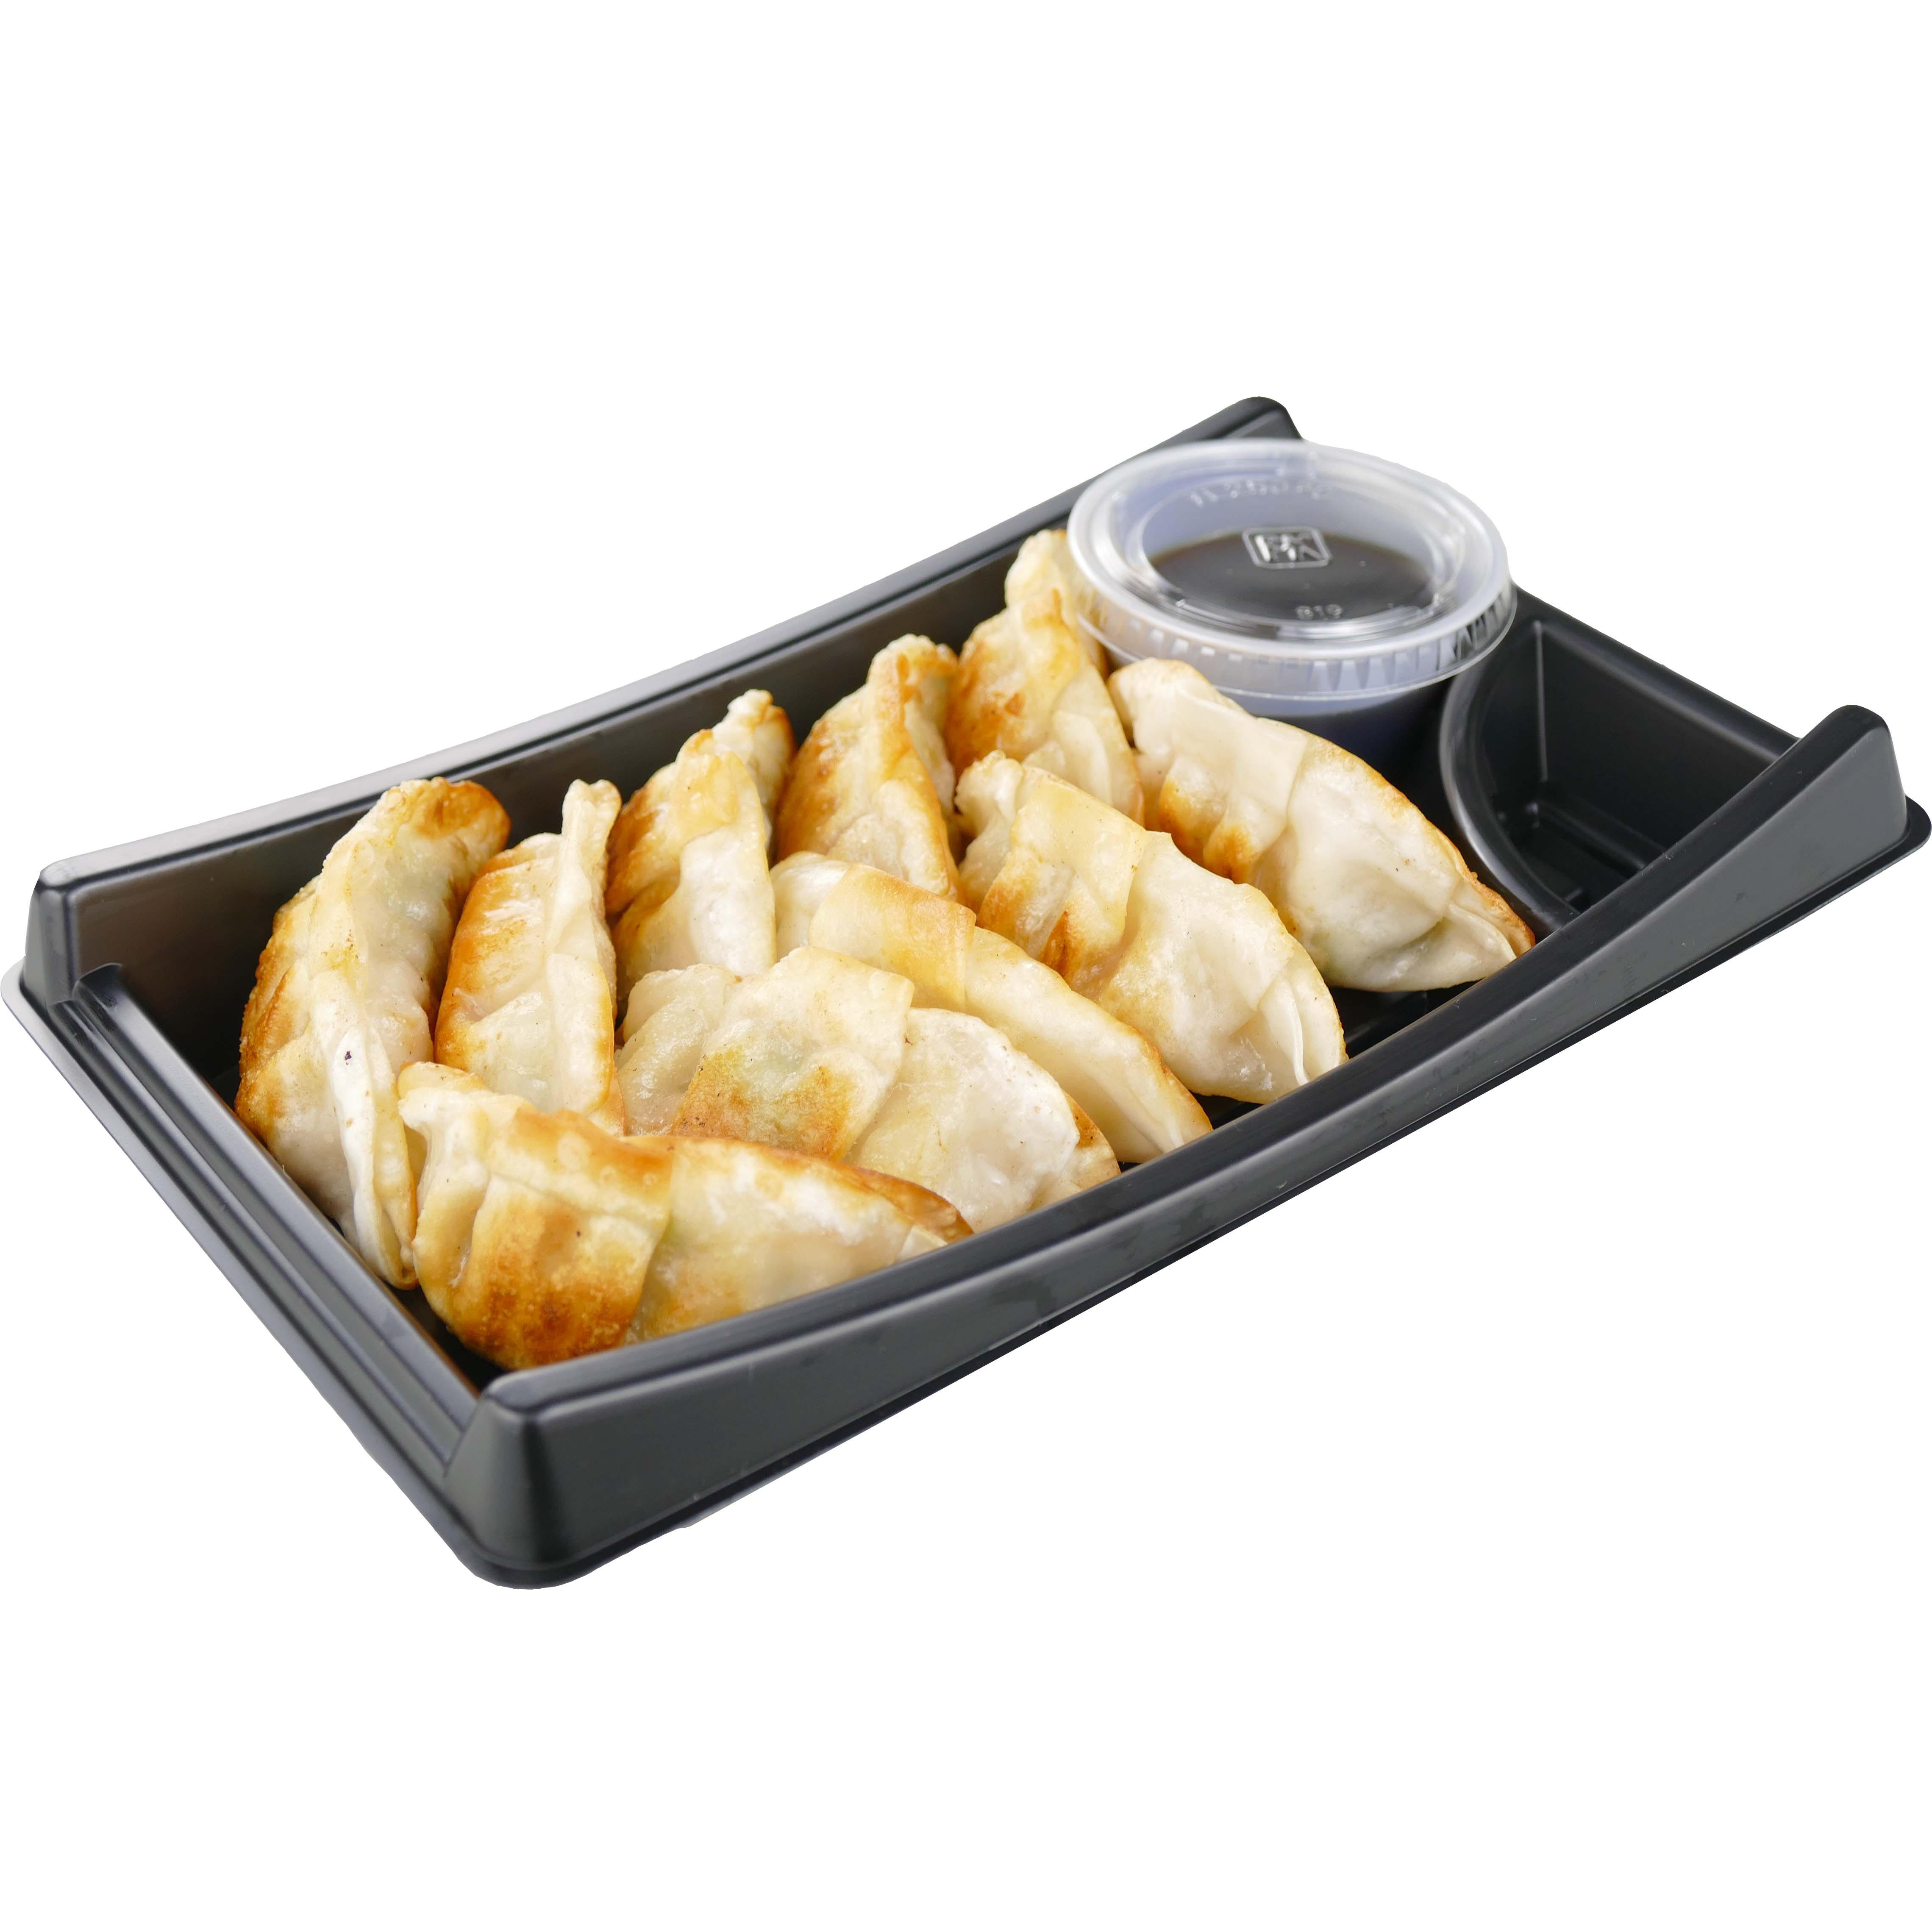 H-E-B Sushiya Edamame Potstickers